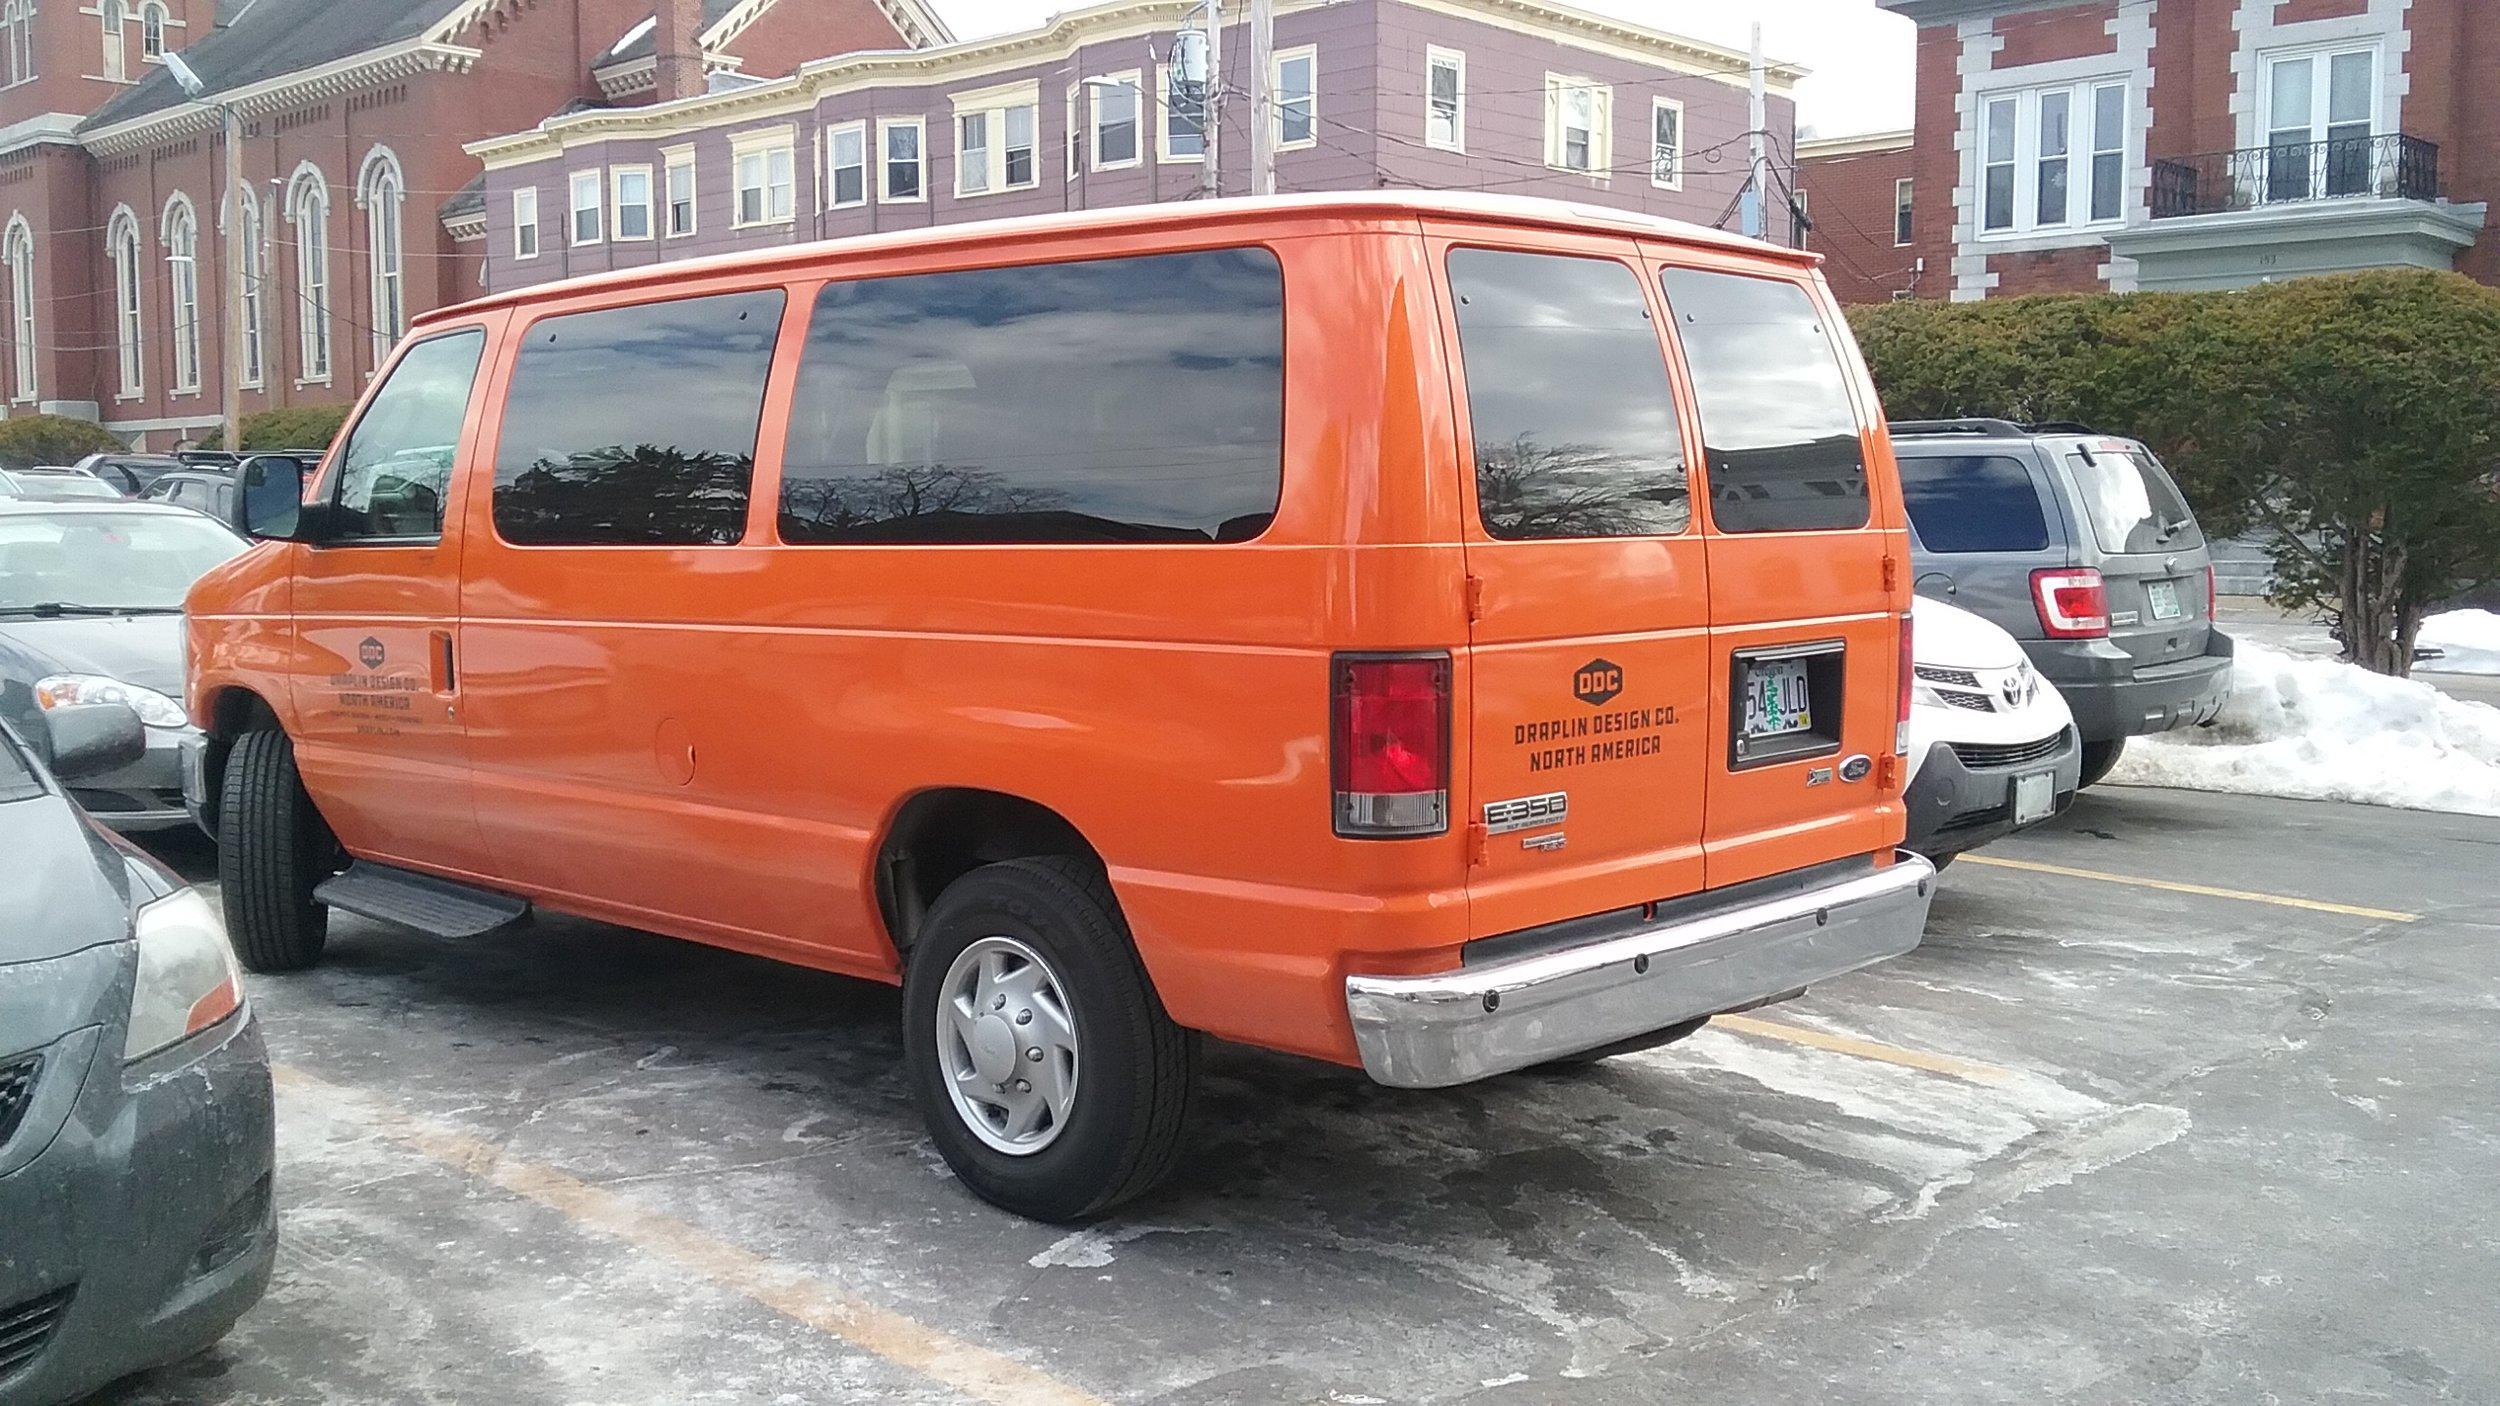 Draplin and his pantone orange touring van. Nice!